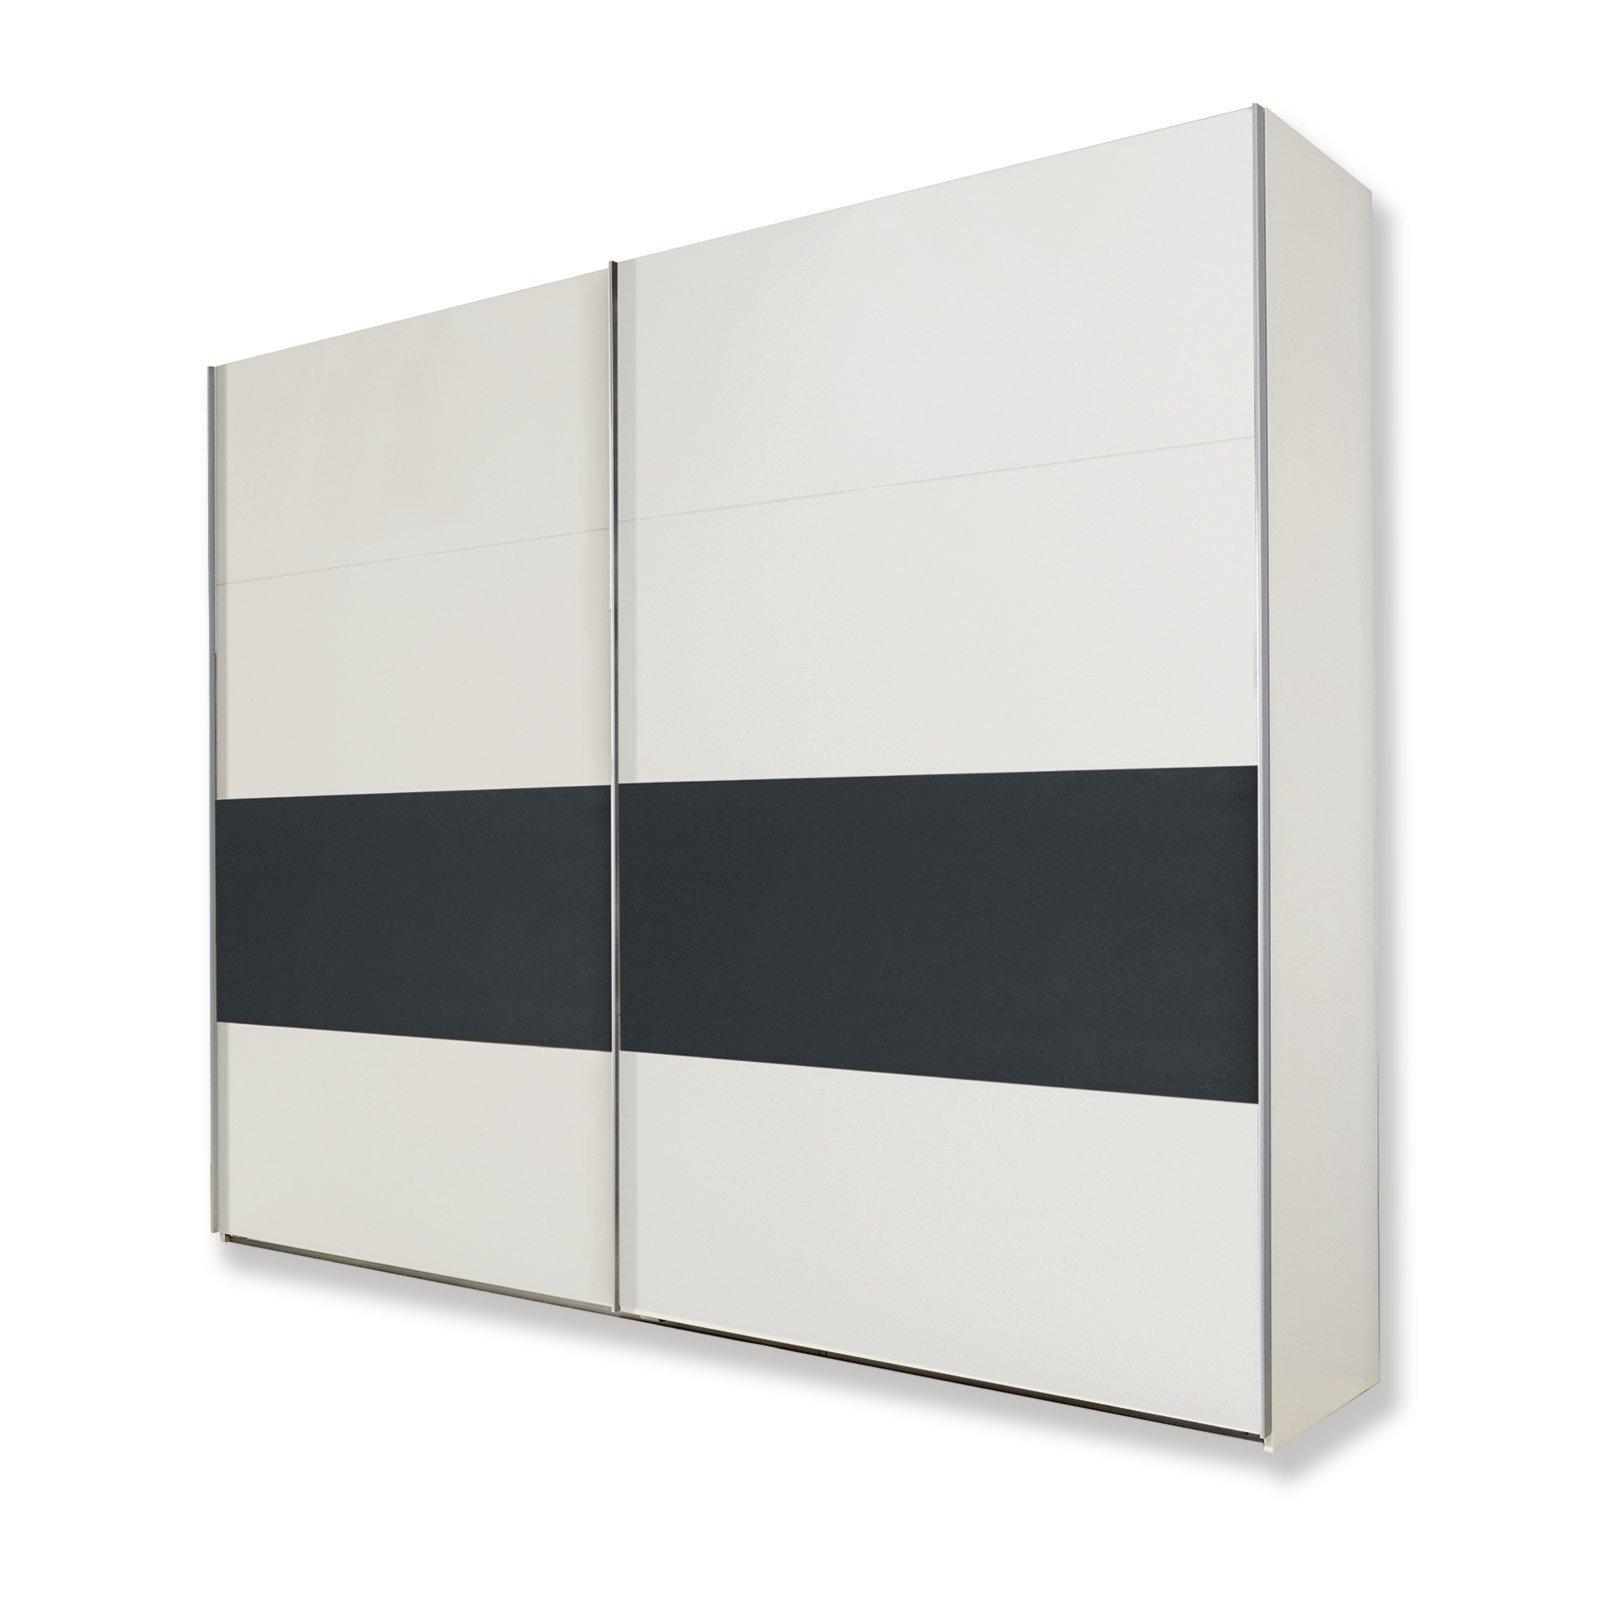 schwebet renschrank bert alpinwei anthrazit 225 cm. Black Bedroom Furniture Sets. Home Design Ideas